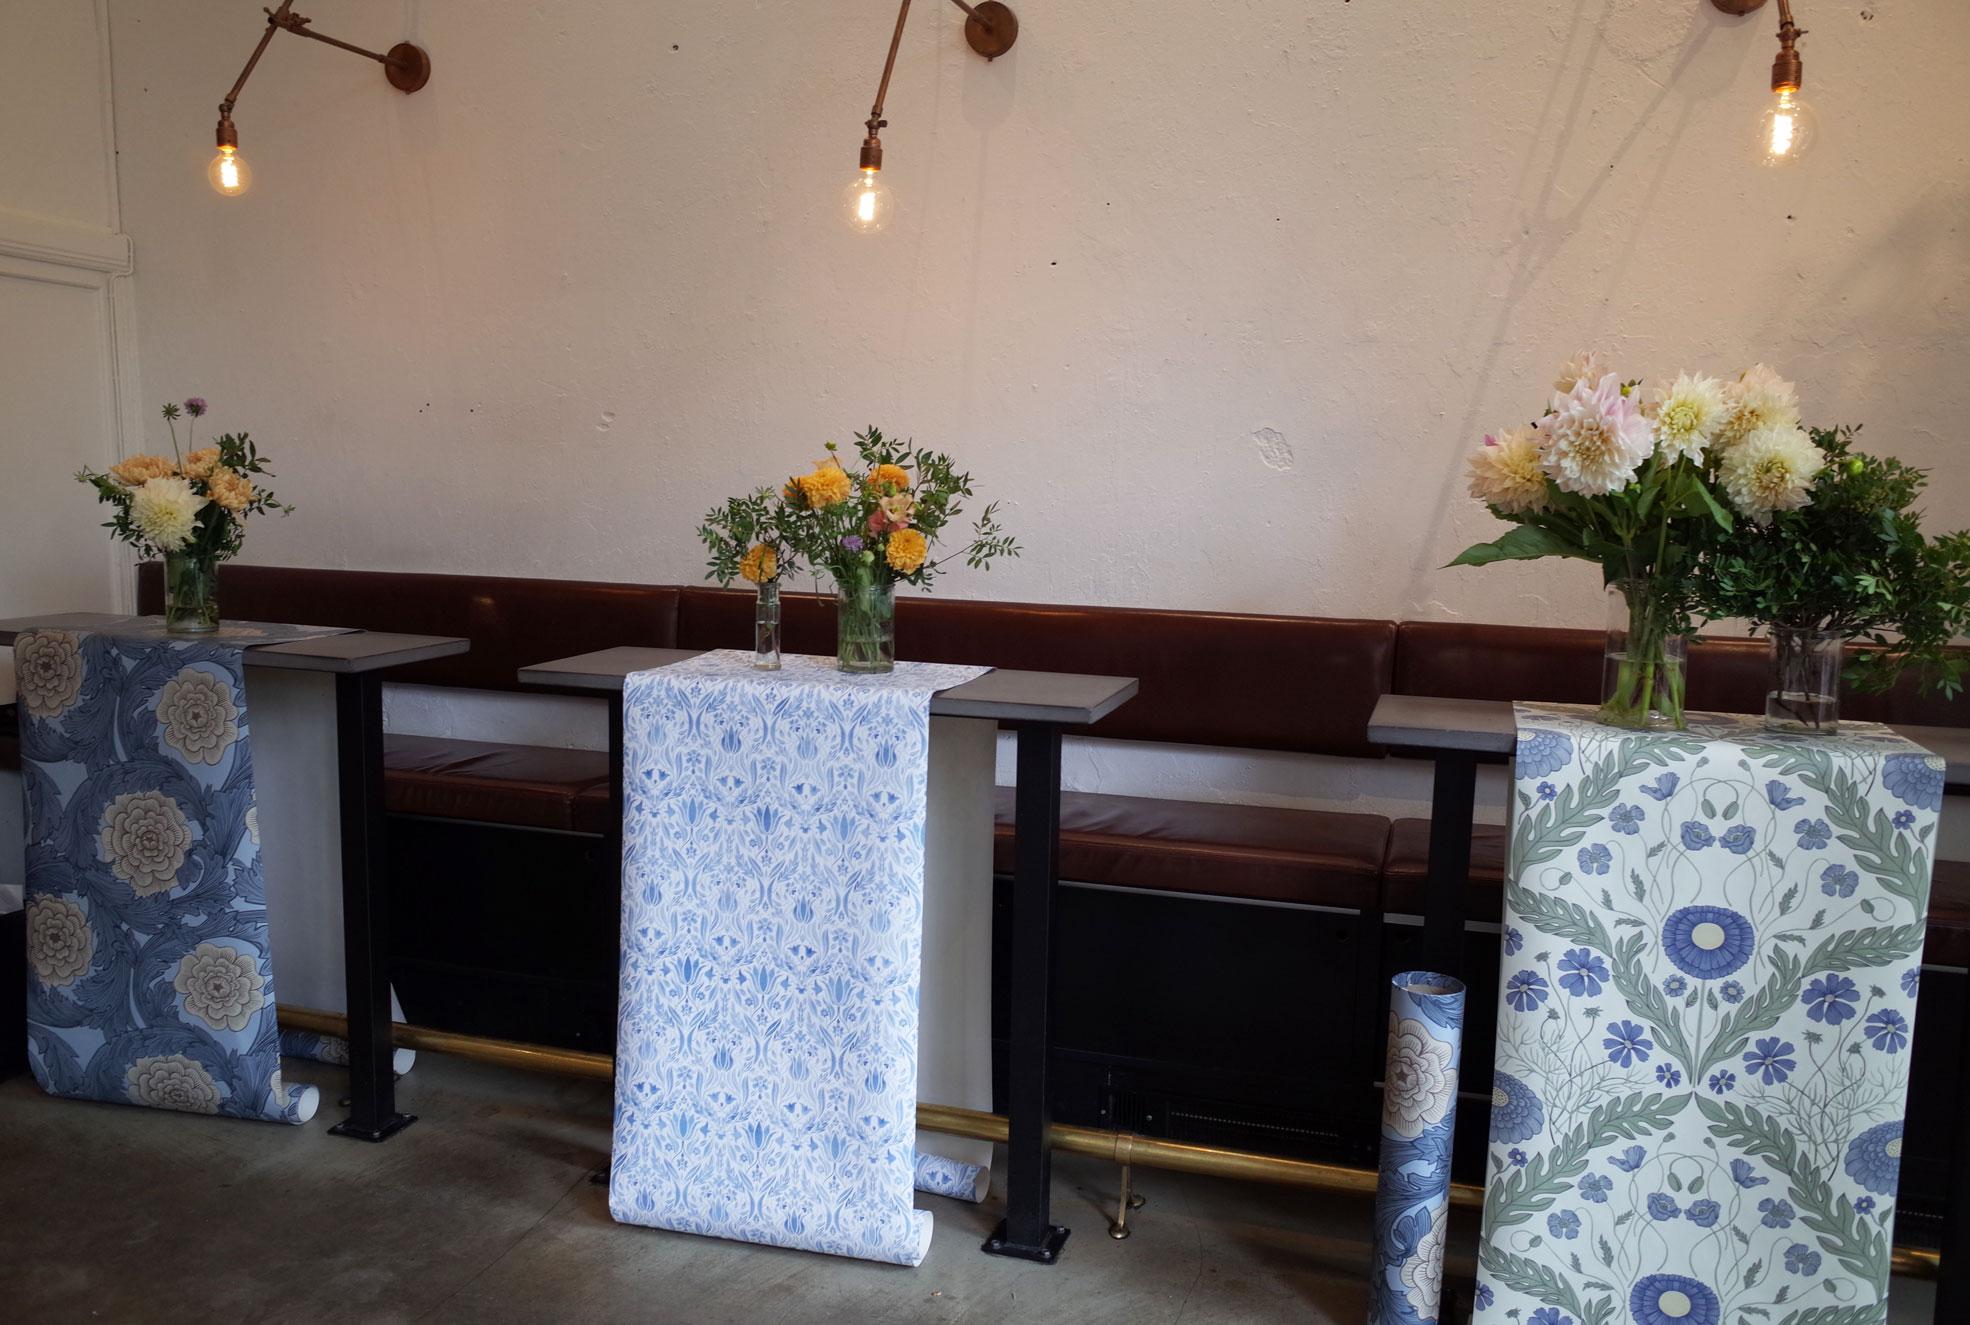 tapetfrukost-lansering-blomstermåla-smörgåsbaren-midbec-tapeter